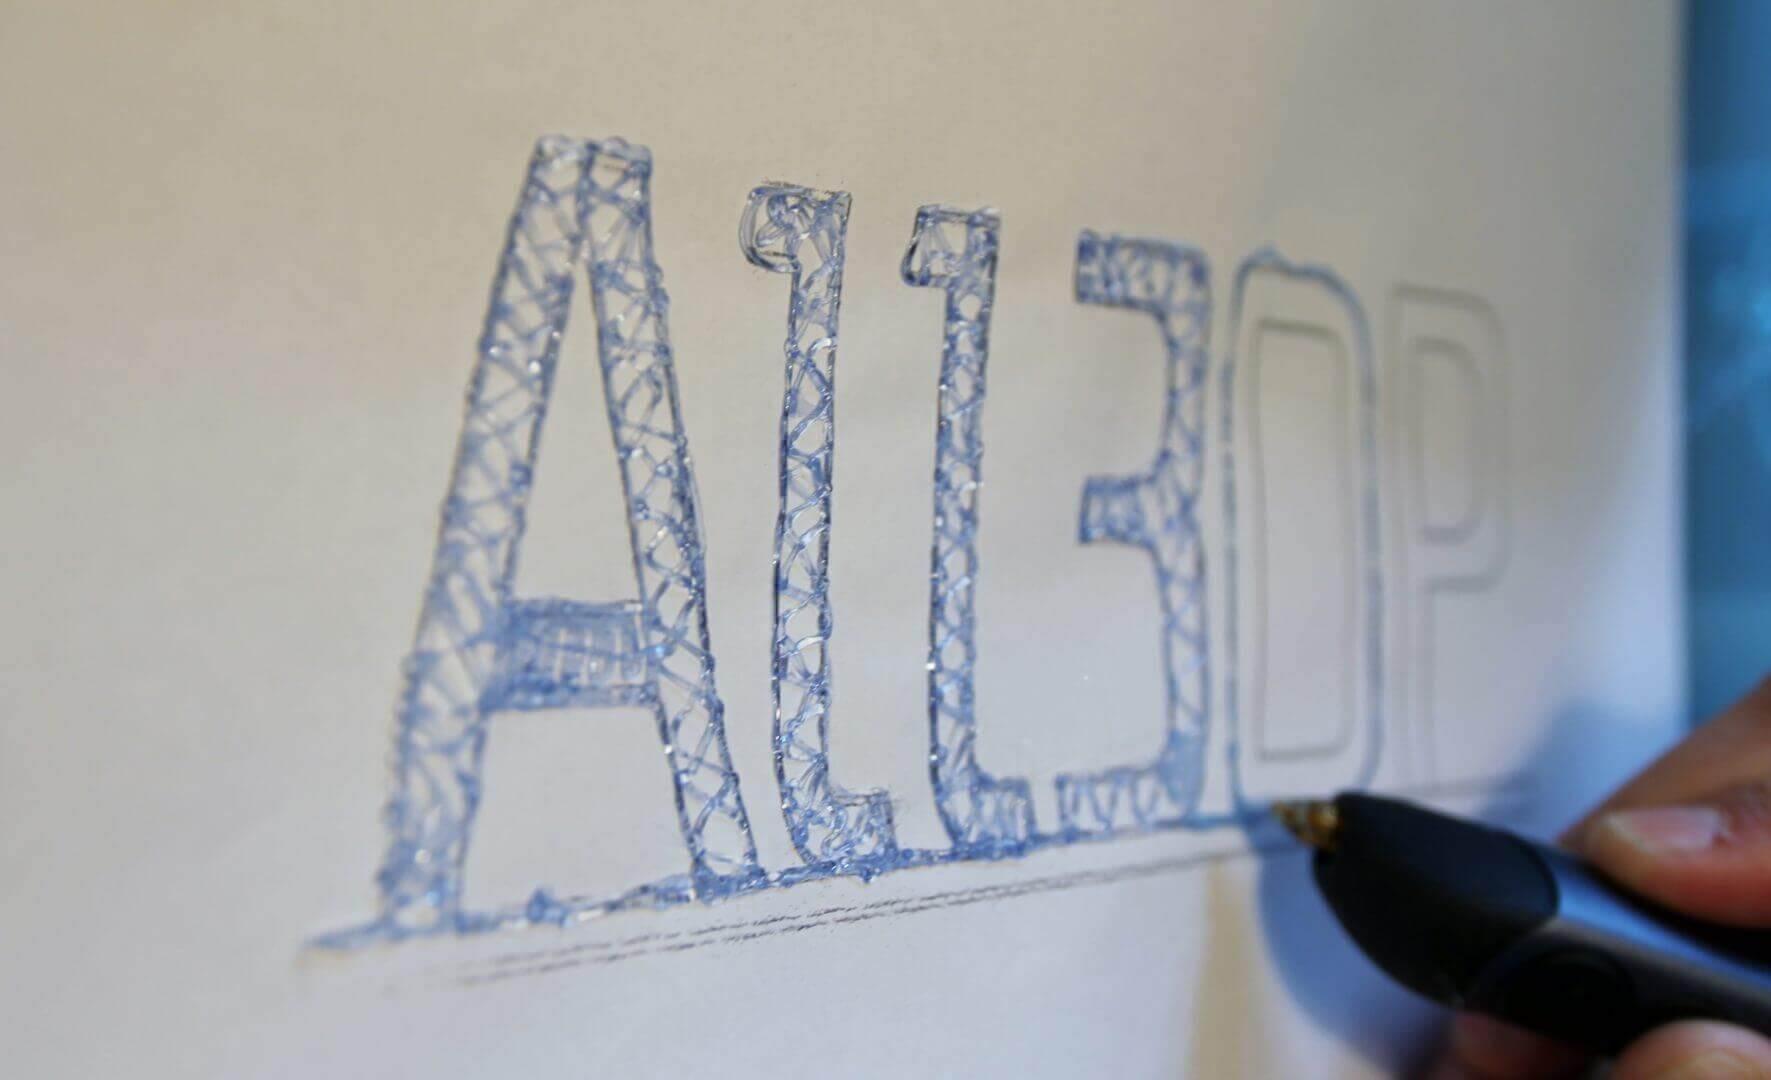 3D Pen Tutorial: 3D Sketch and Create Free 3D Pen Stencils | All3DP